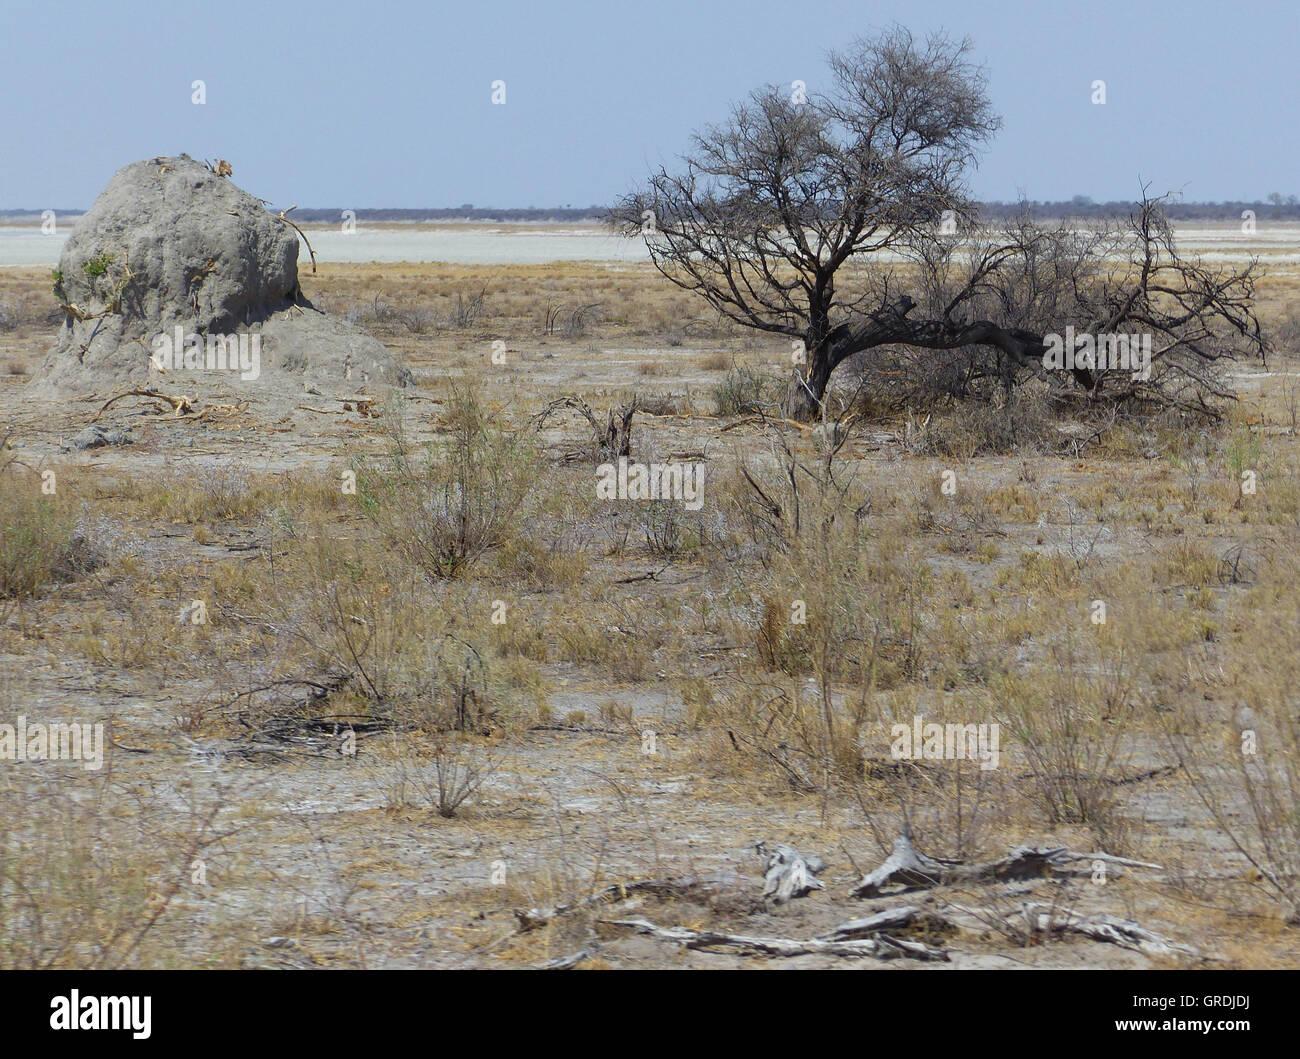 Termite Mound And Next To It A Leafless Tree, In Etosha Pan - Stock Image